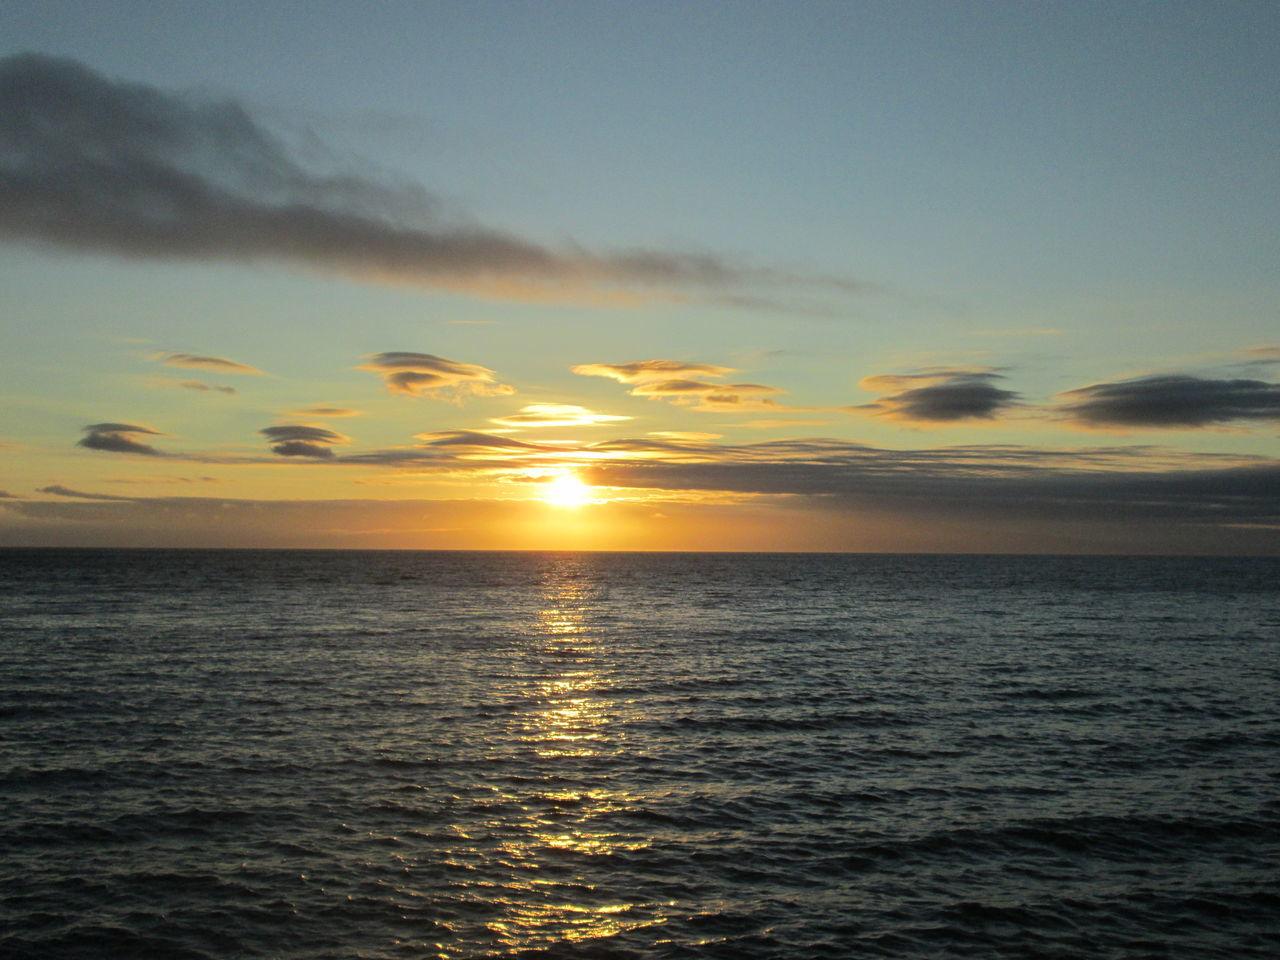 sunset, sea, freedom, sun, water, scenics, tranquility, nature, tranquil scene, beauty in nature, idyllic, vistas, horizon over water, sky, no people, beach, horizon, outdoors